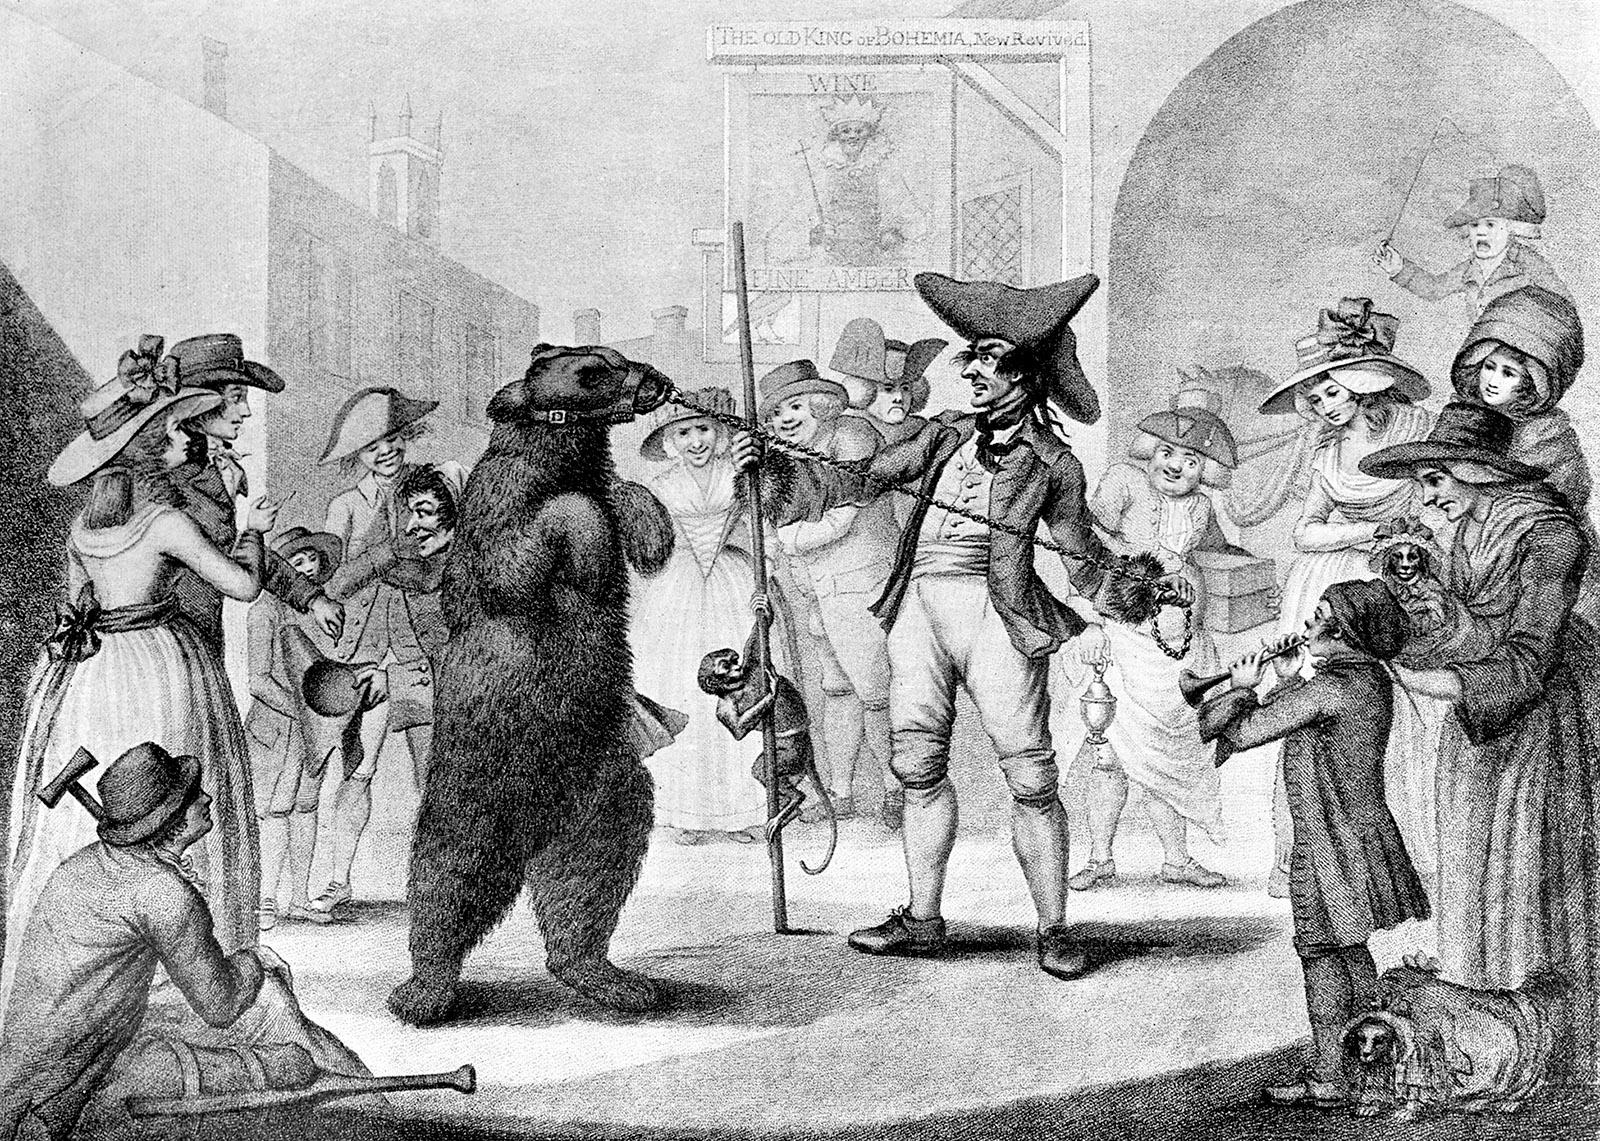 'Dancing Bear'; illustration by C. Knight, 1875